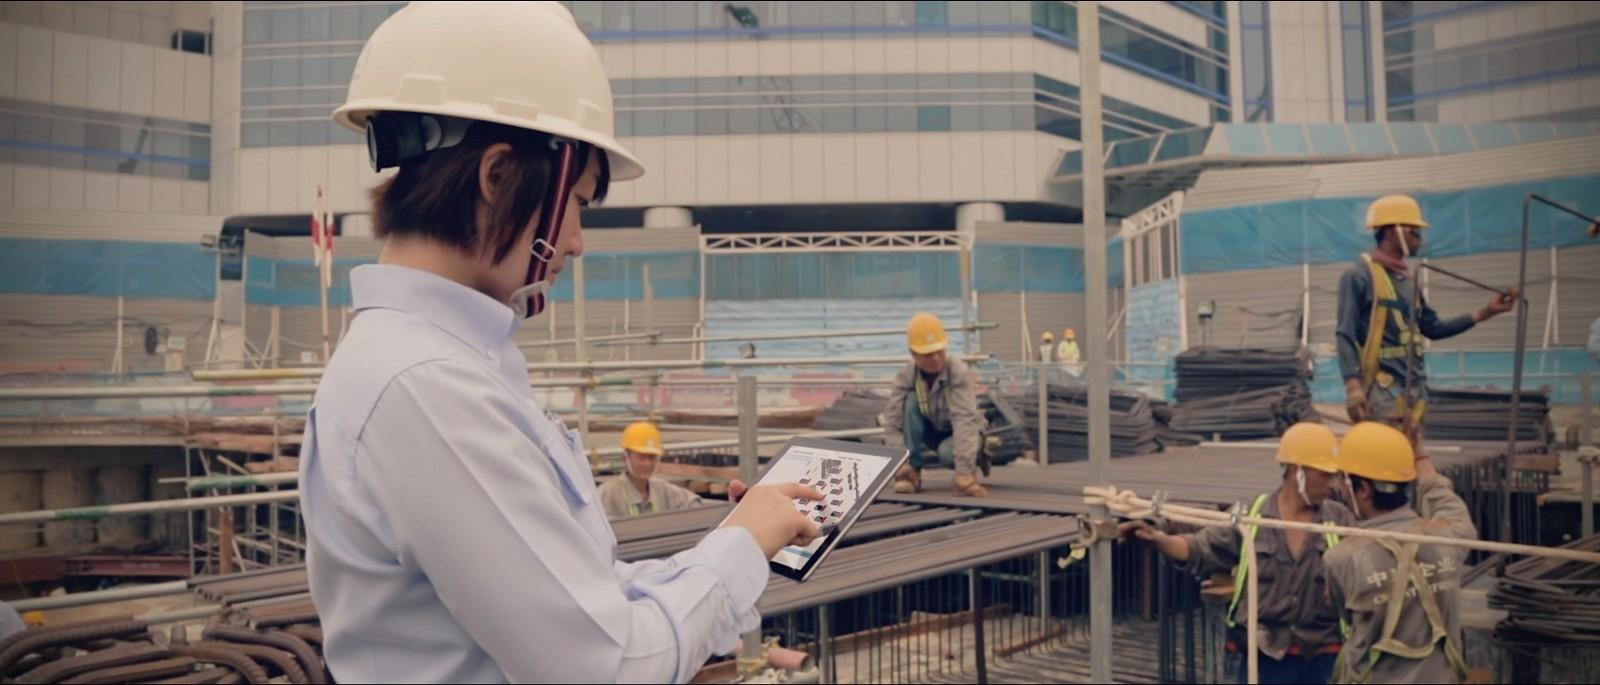 Big Data + Construction: How Contractors Leverage A Valuable Partnership